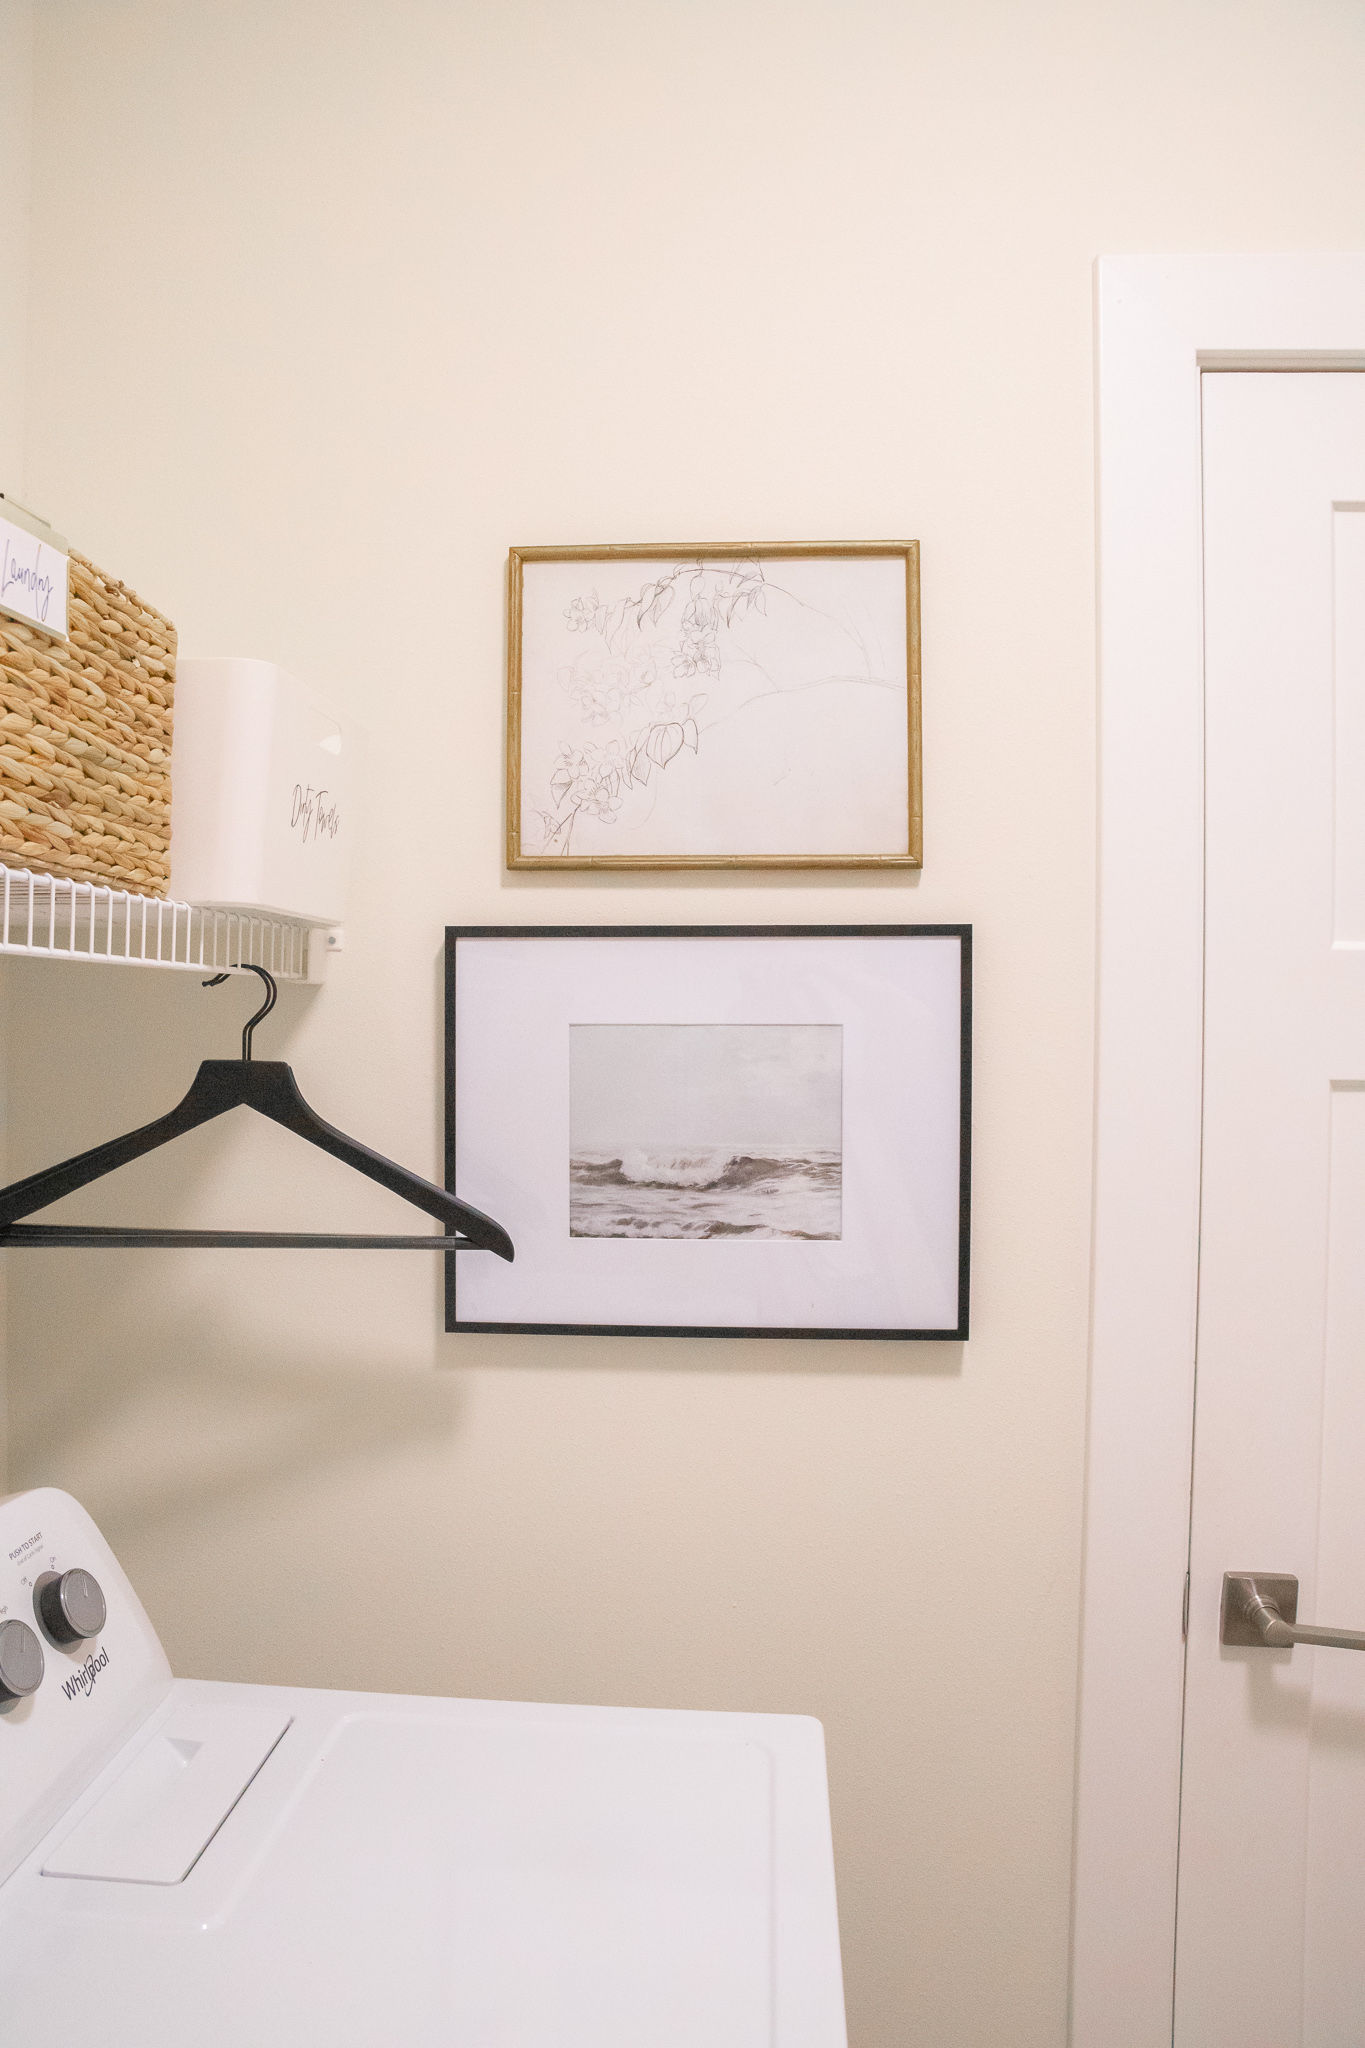 apartment laundry room decor ideas